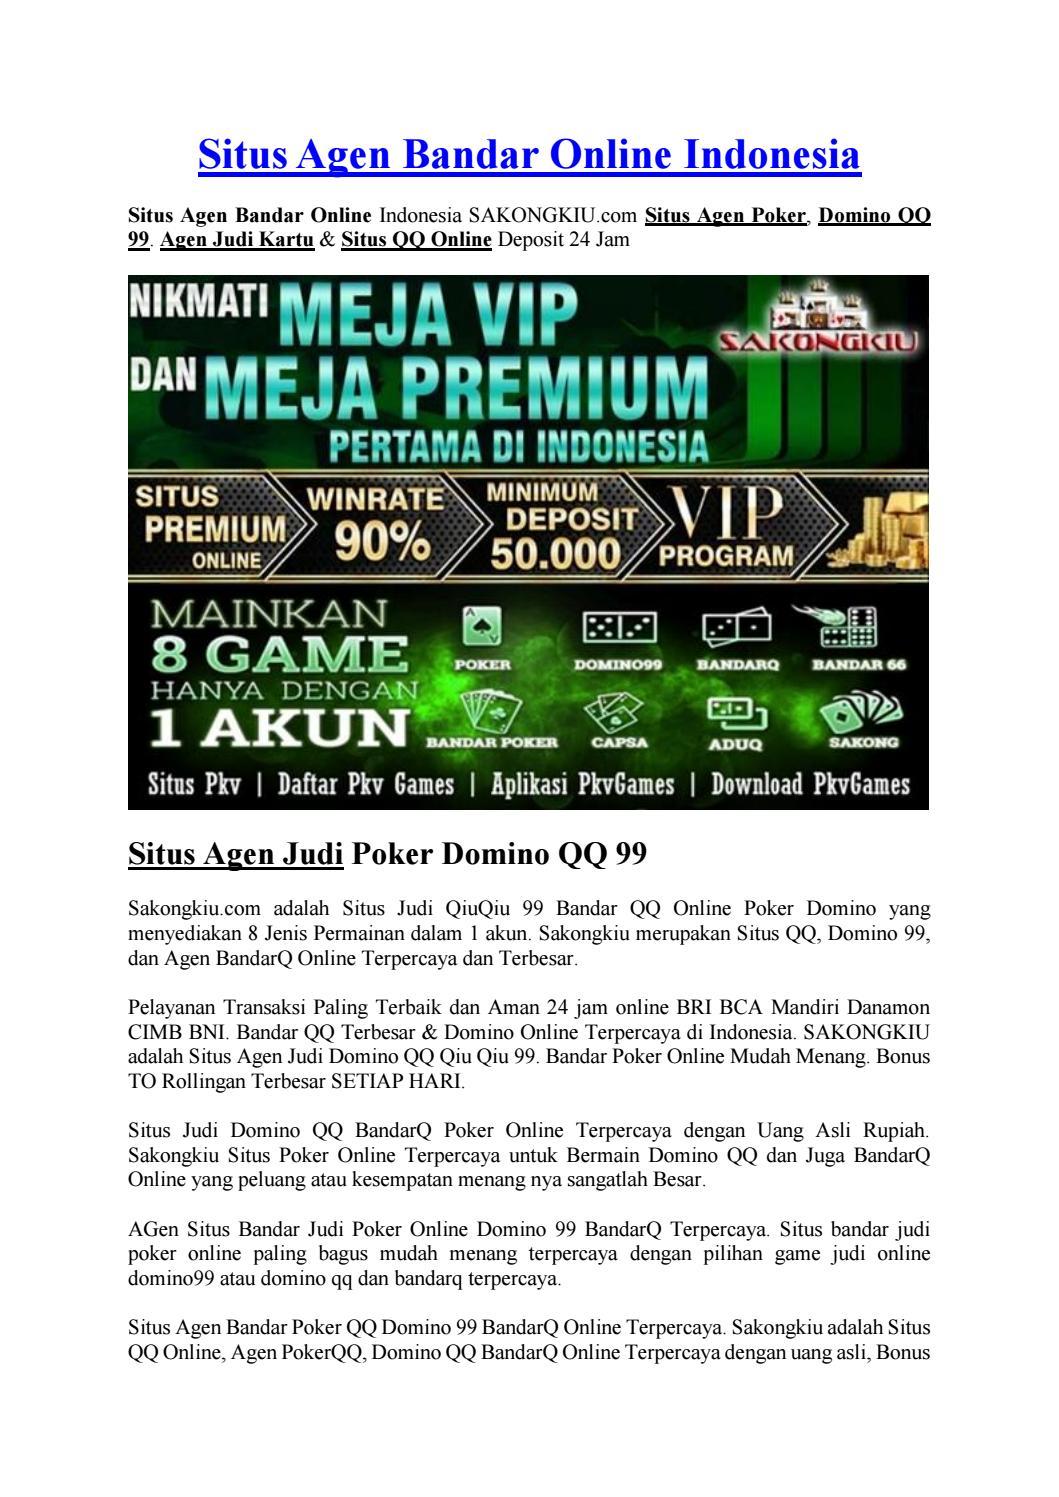 Situs Agen Bandar Online Indonesia By Pokercapsadomino Issuu